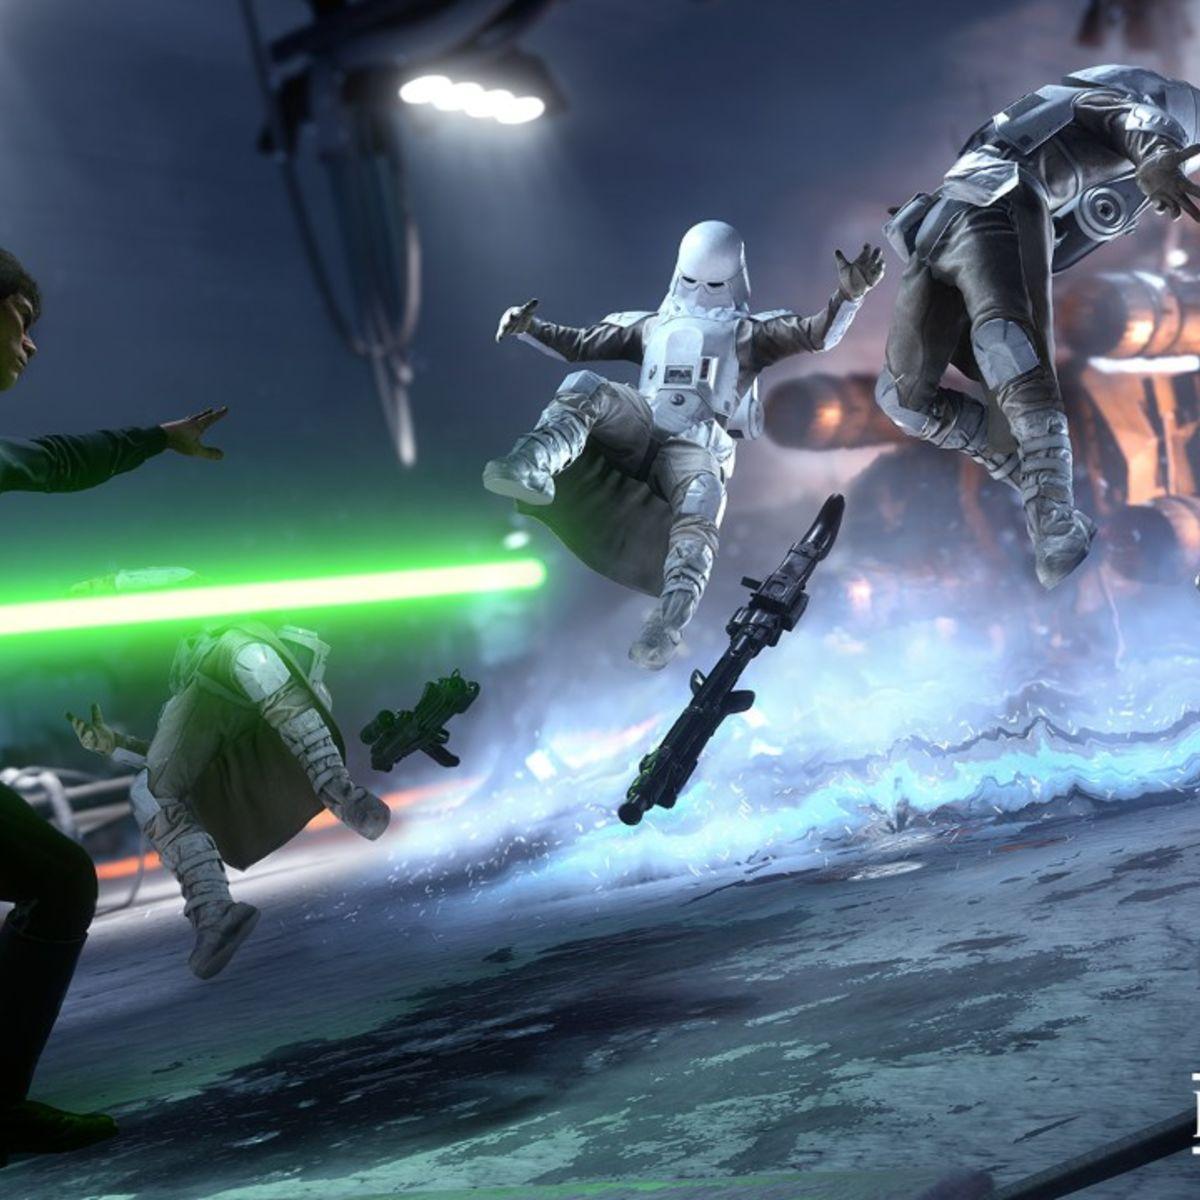 StarWars_Battlefront_LukeSkywalker.jpg